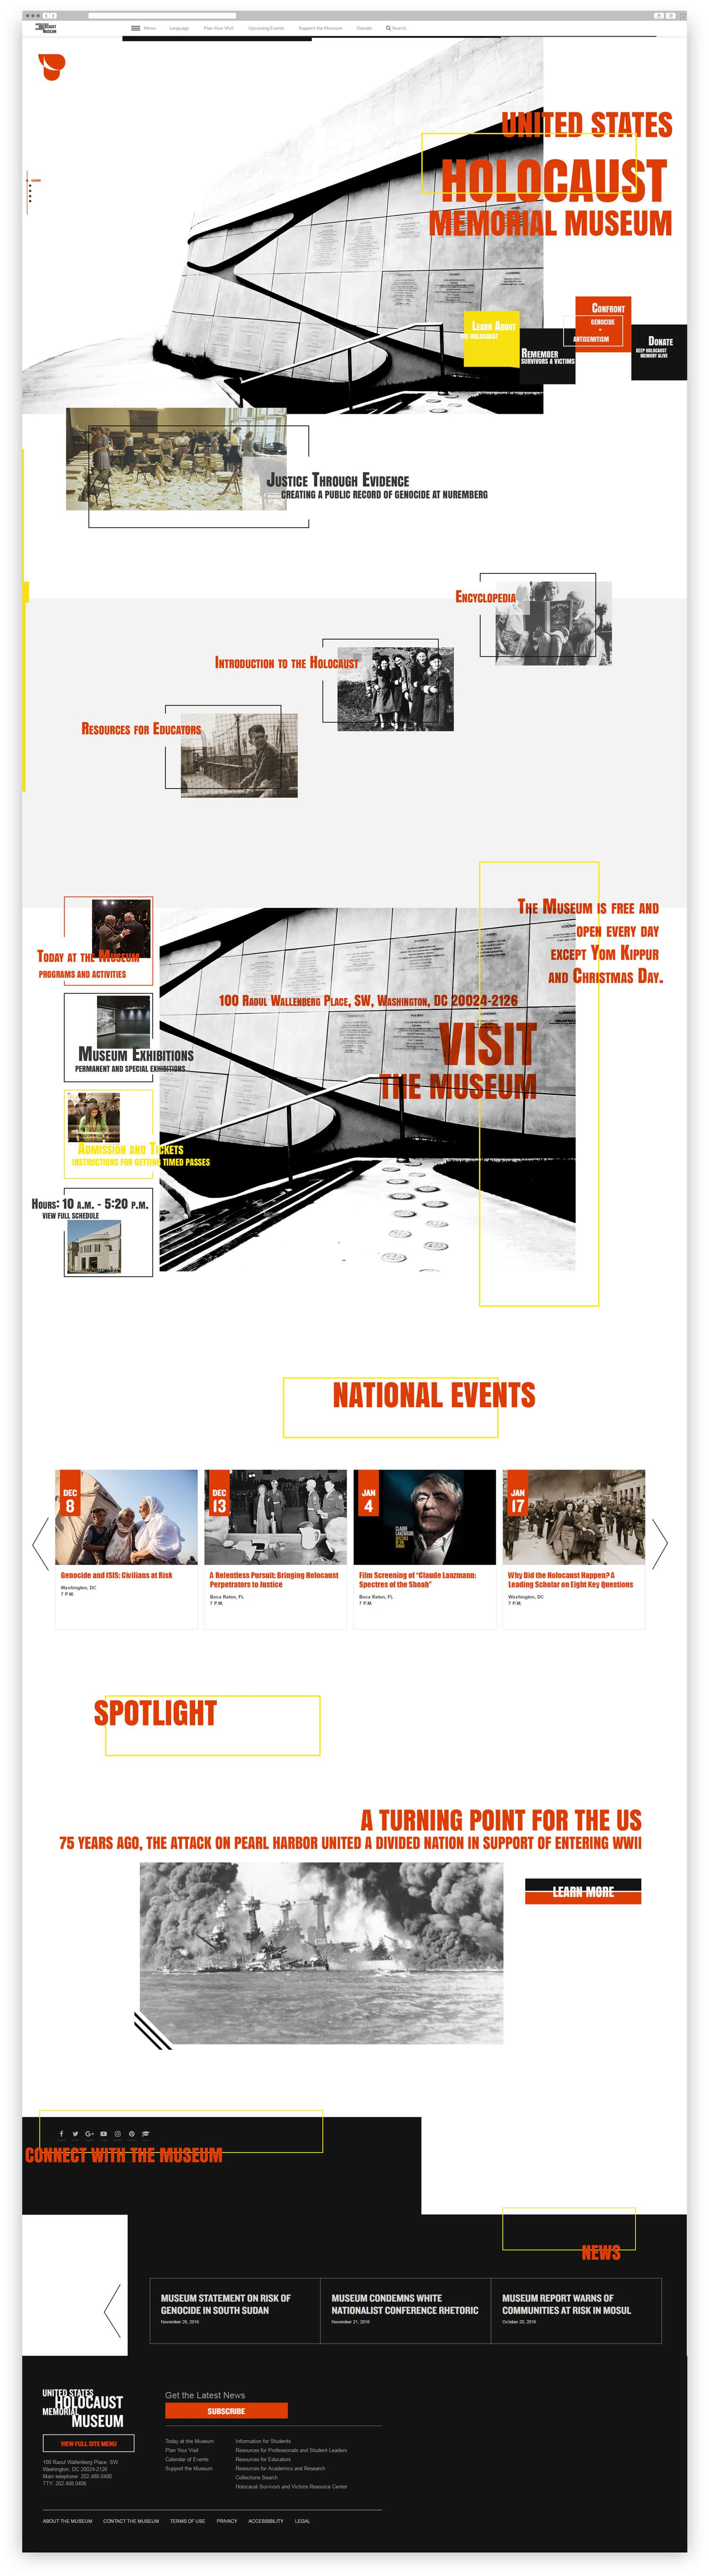 USHMM full front web page final design